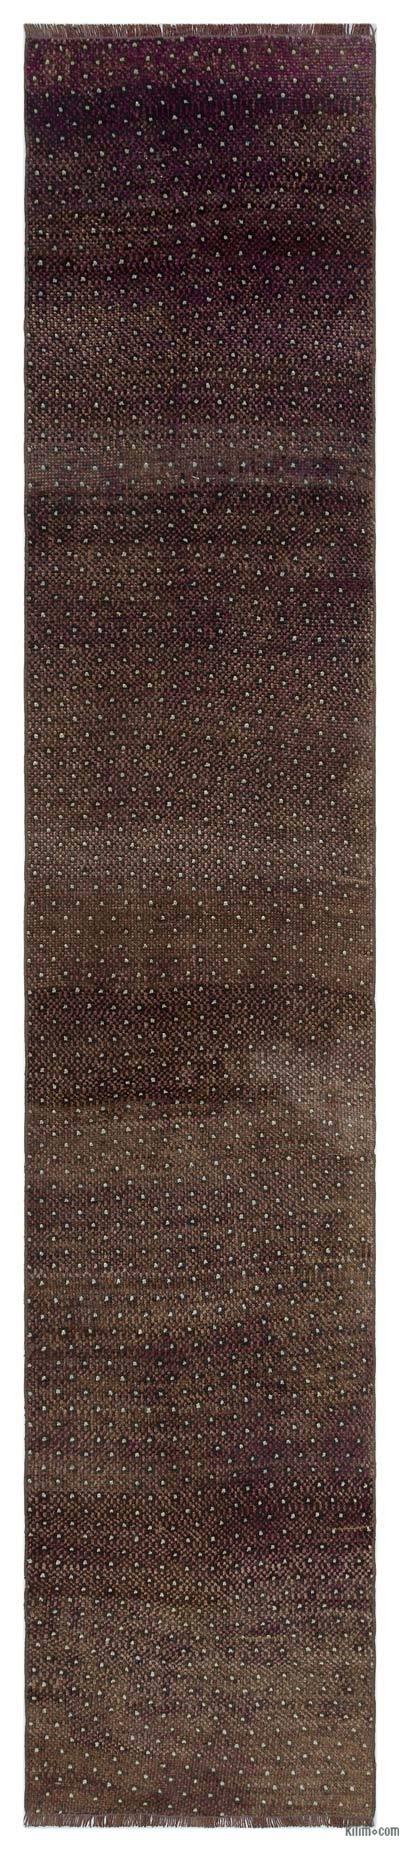 Alfombra Turca Vintage de Pasillo - 68 cm x 344 cm